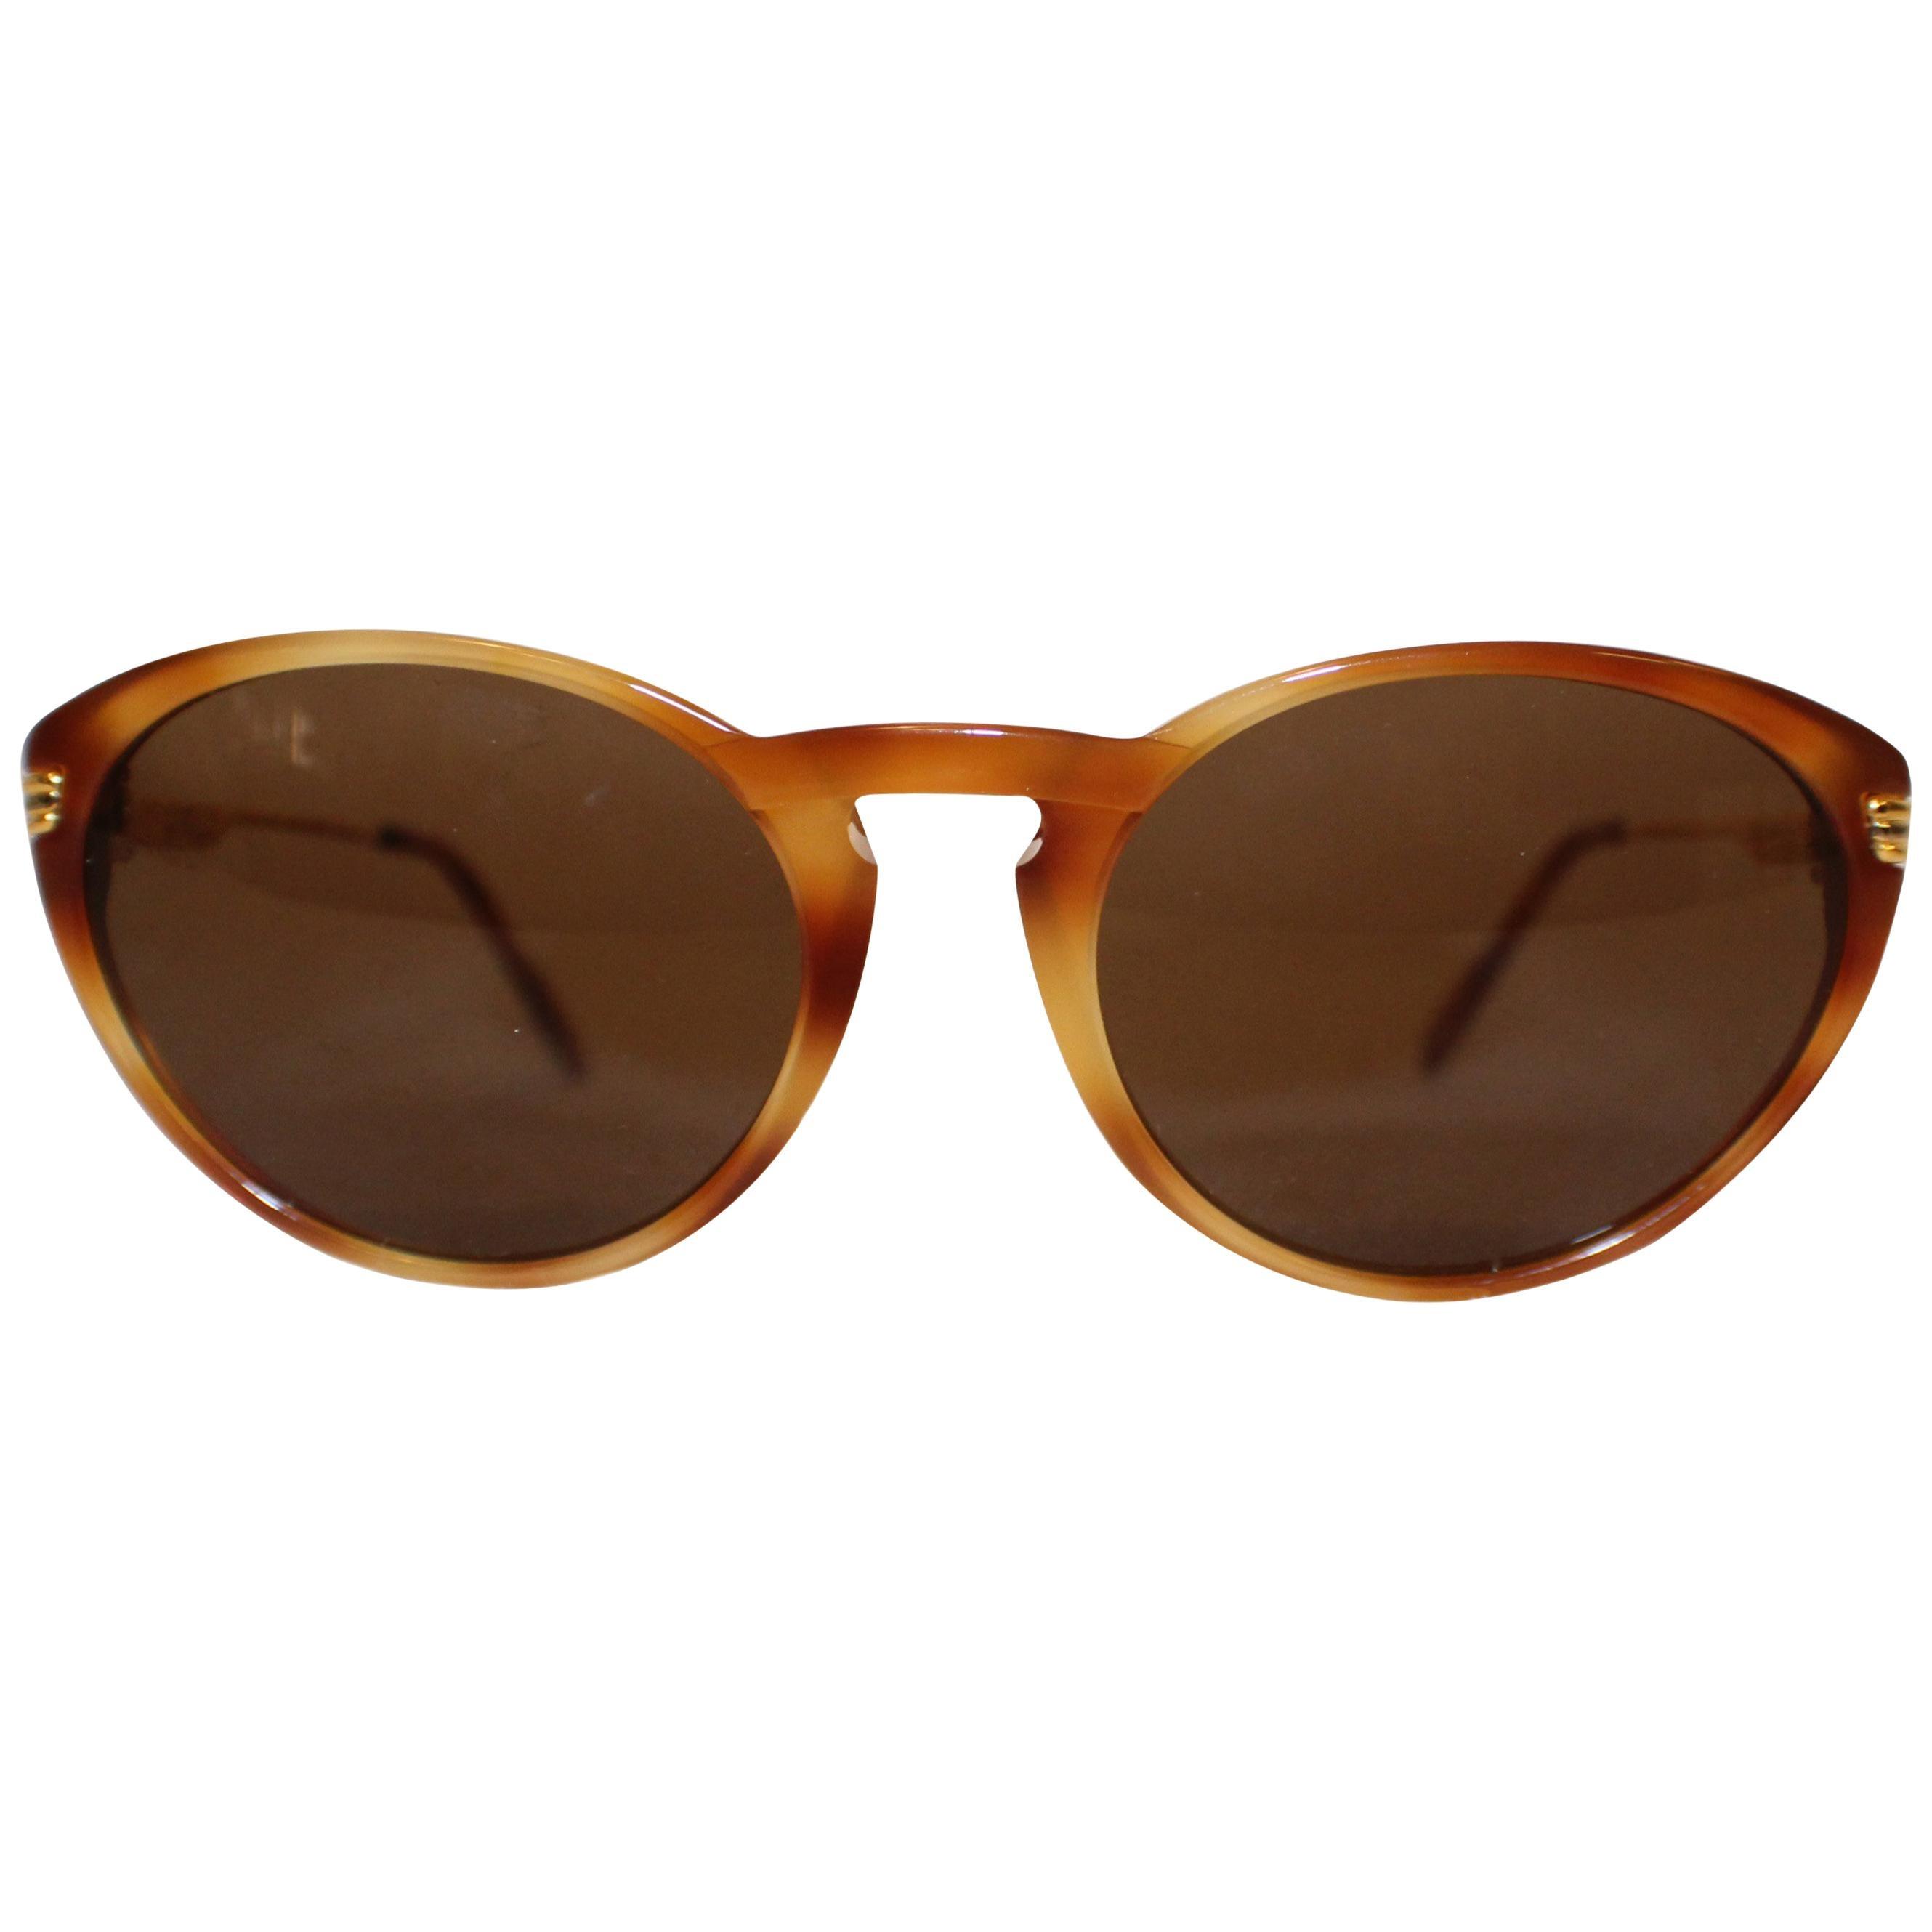 e9c4b5c5b6c Tortoise Shell Sunglasses - 69 For Sale on 1stdibs